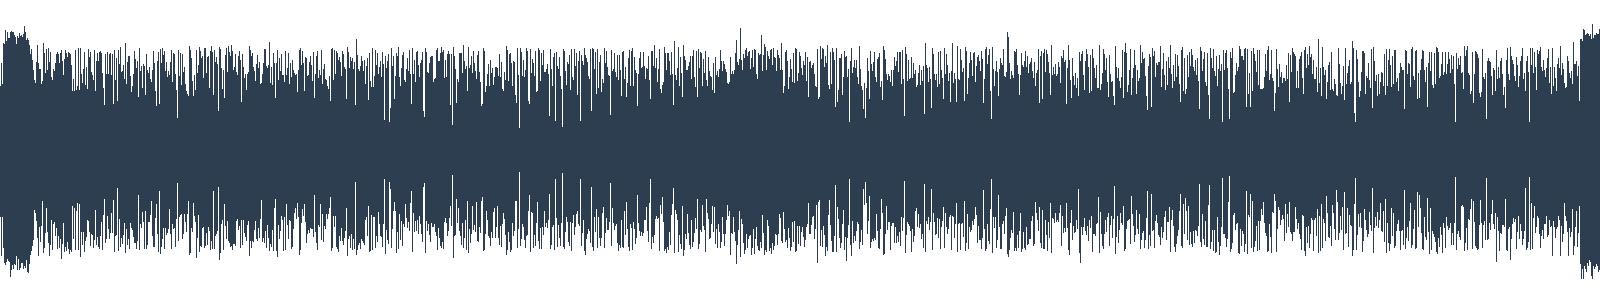 Letné horúčavy waveform